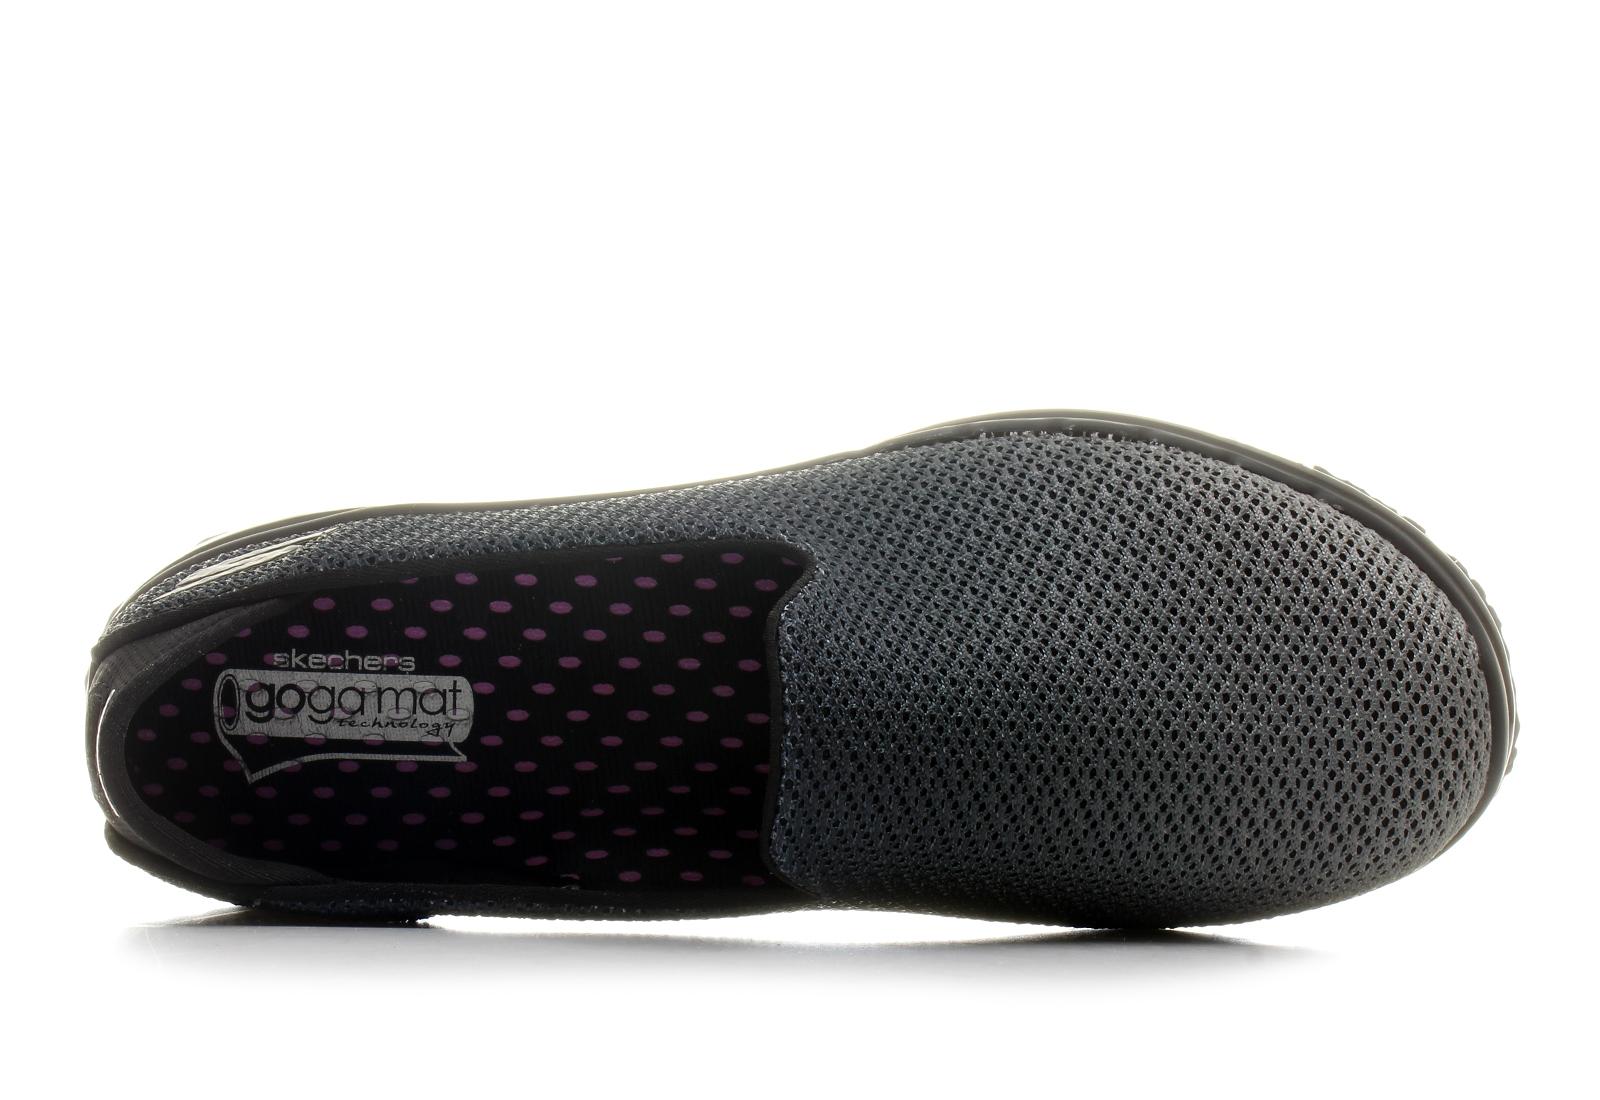 Skechers Slip-on - Lotus - 14014-bkgy - Online shop for sneakers ... 5d0065bec2